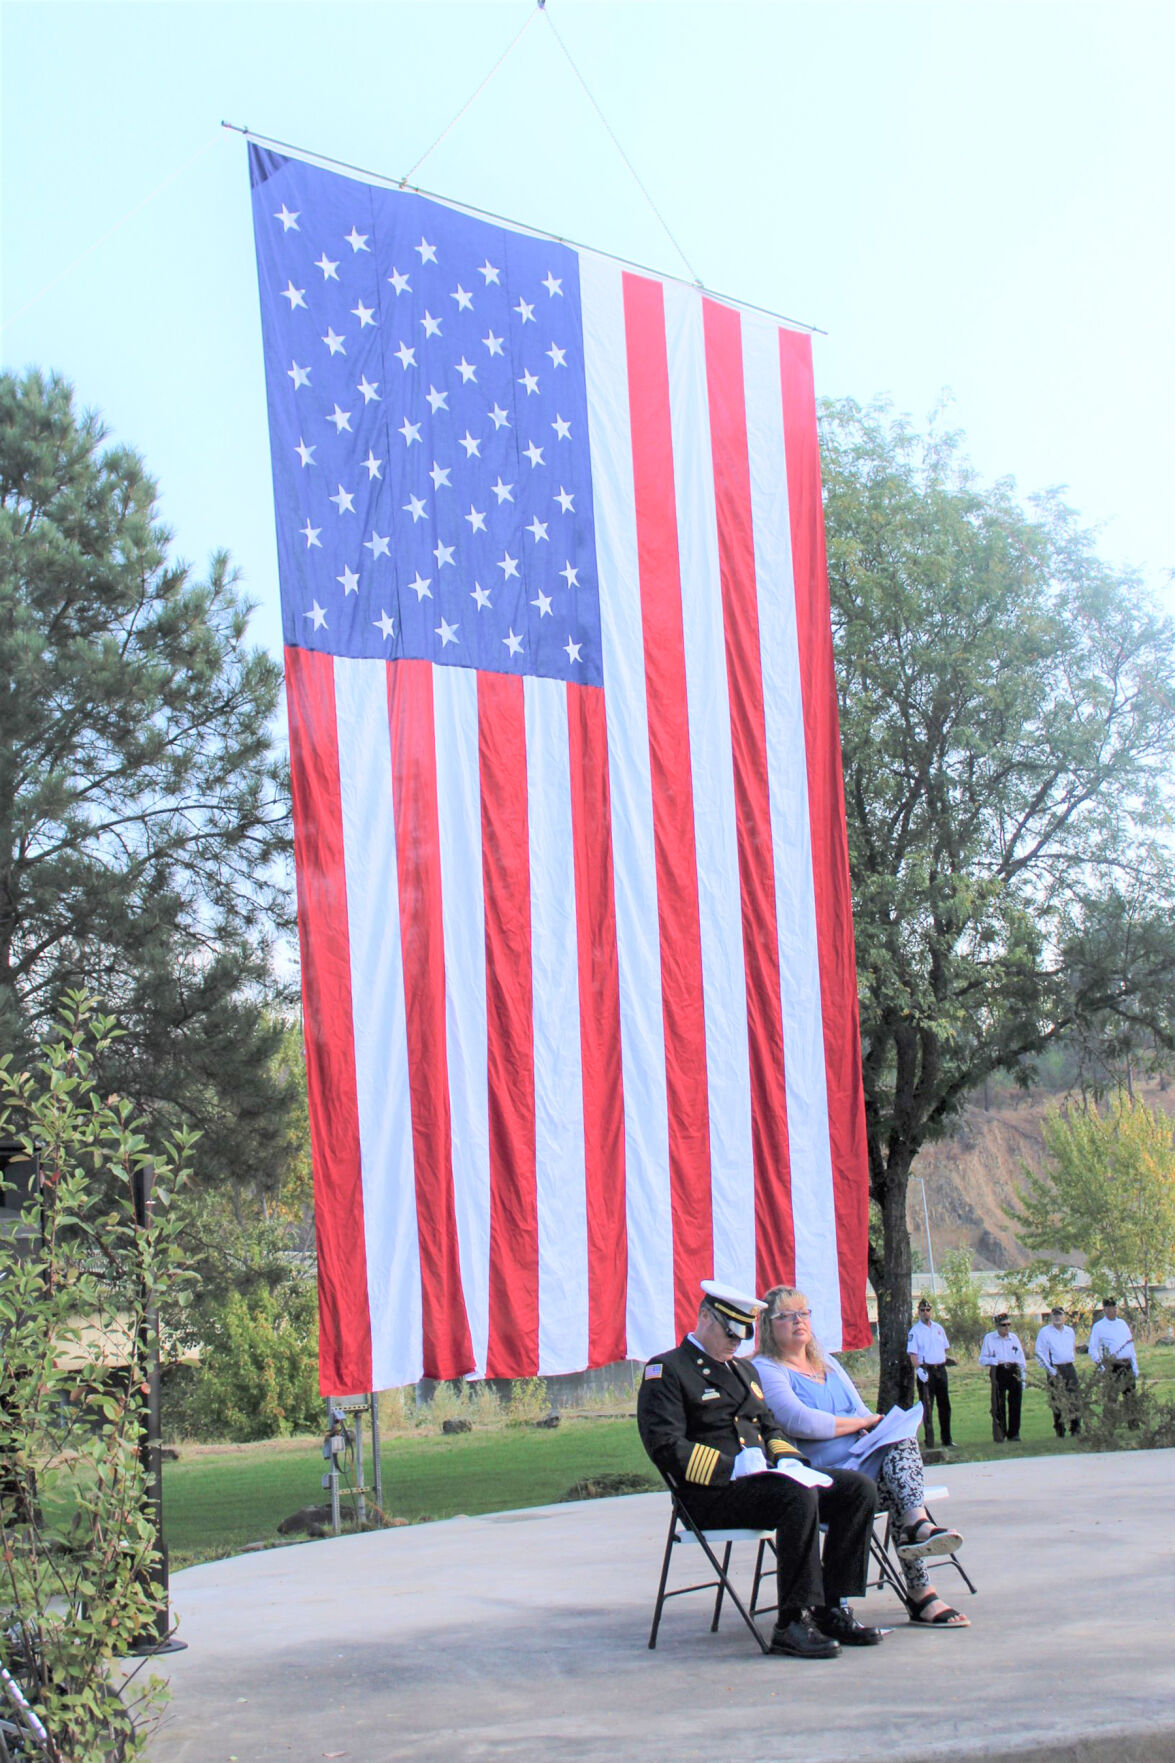 9/11 remembrance photo 2